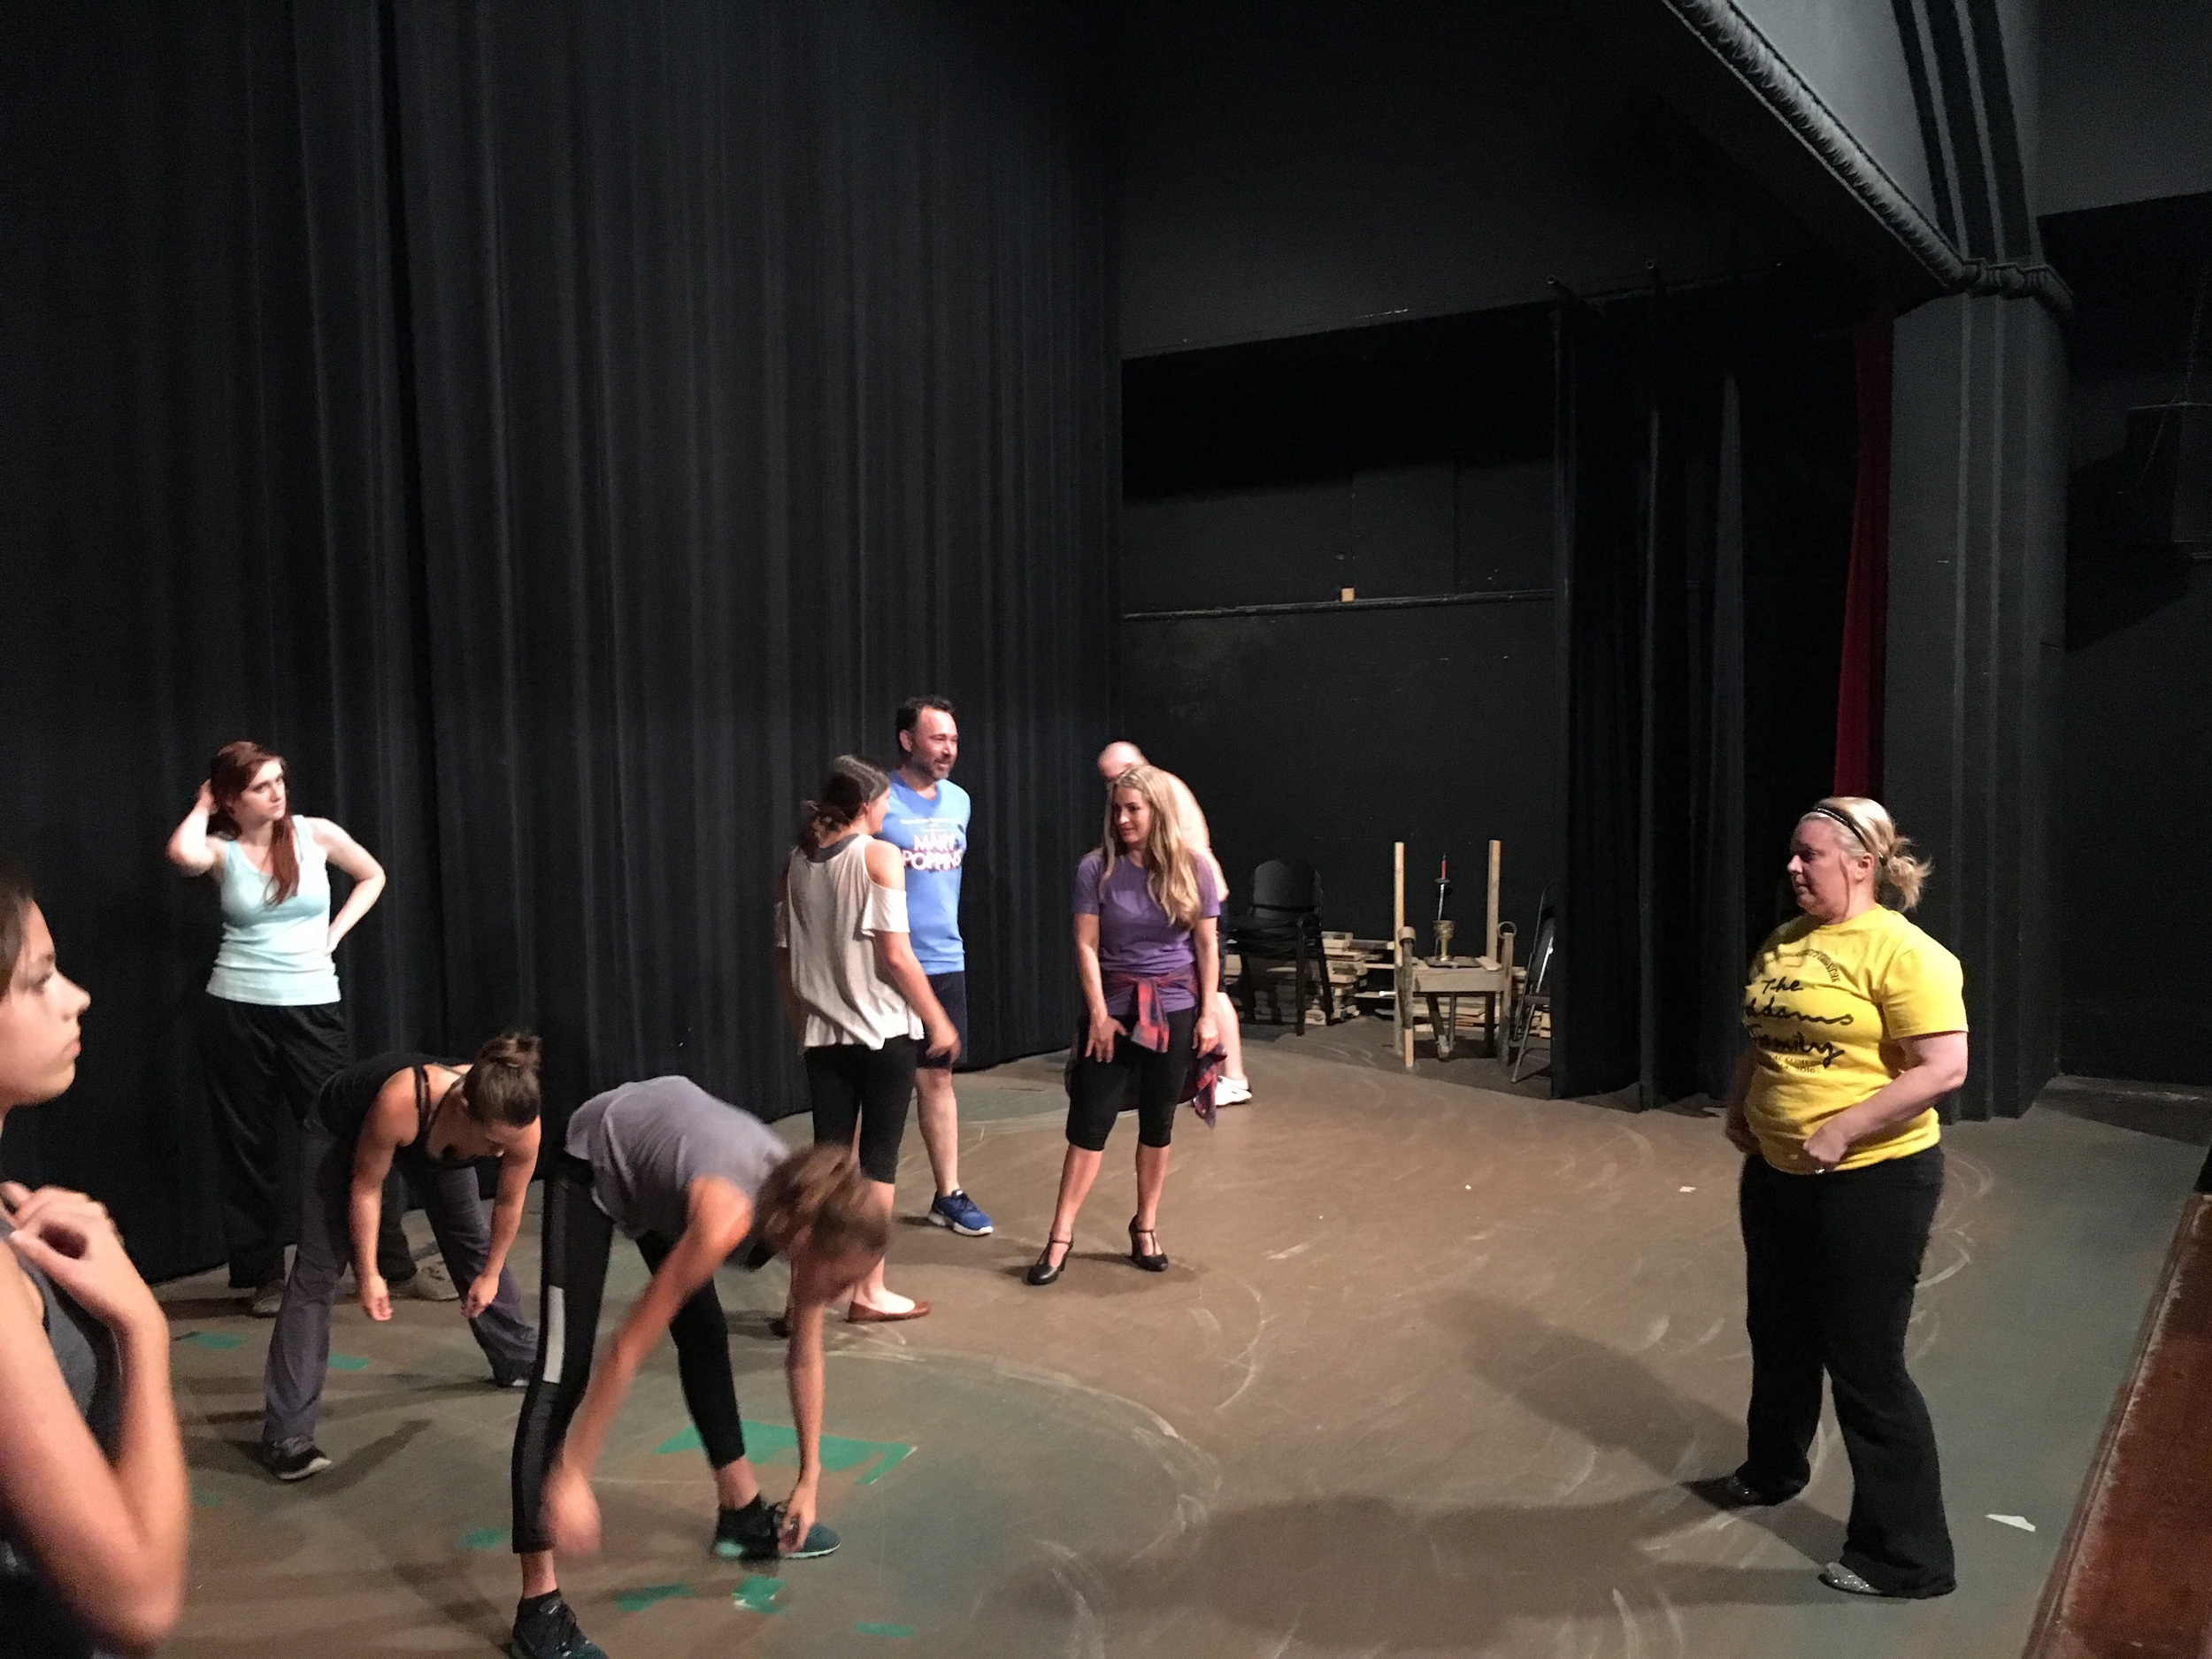 Ancestors working on choreography